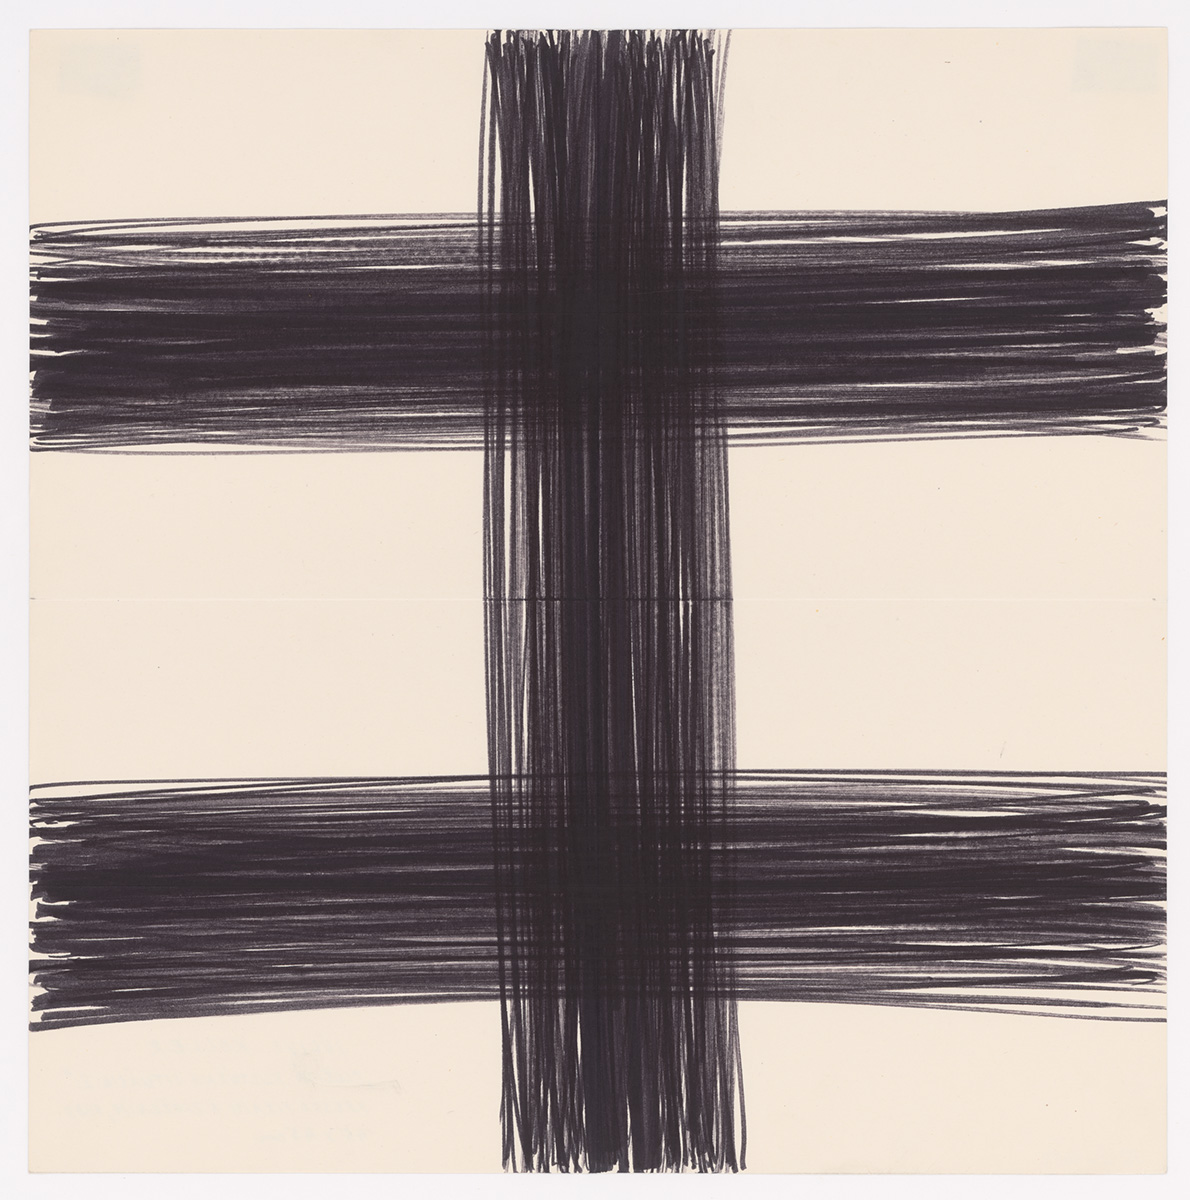 Július Koller, Zložitá kultúrna situácia II.. 1989. Považská galéria umenia